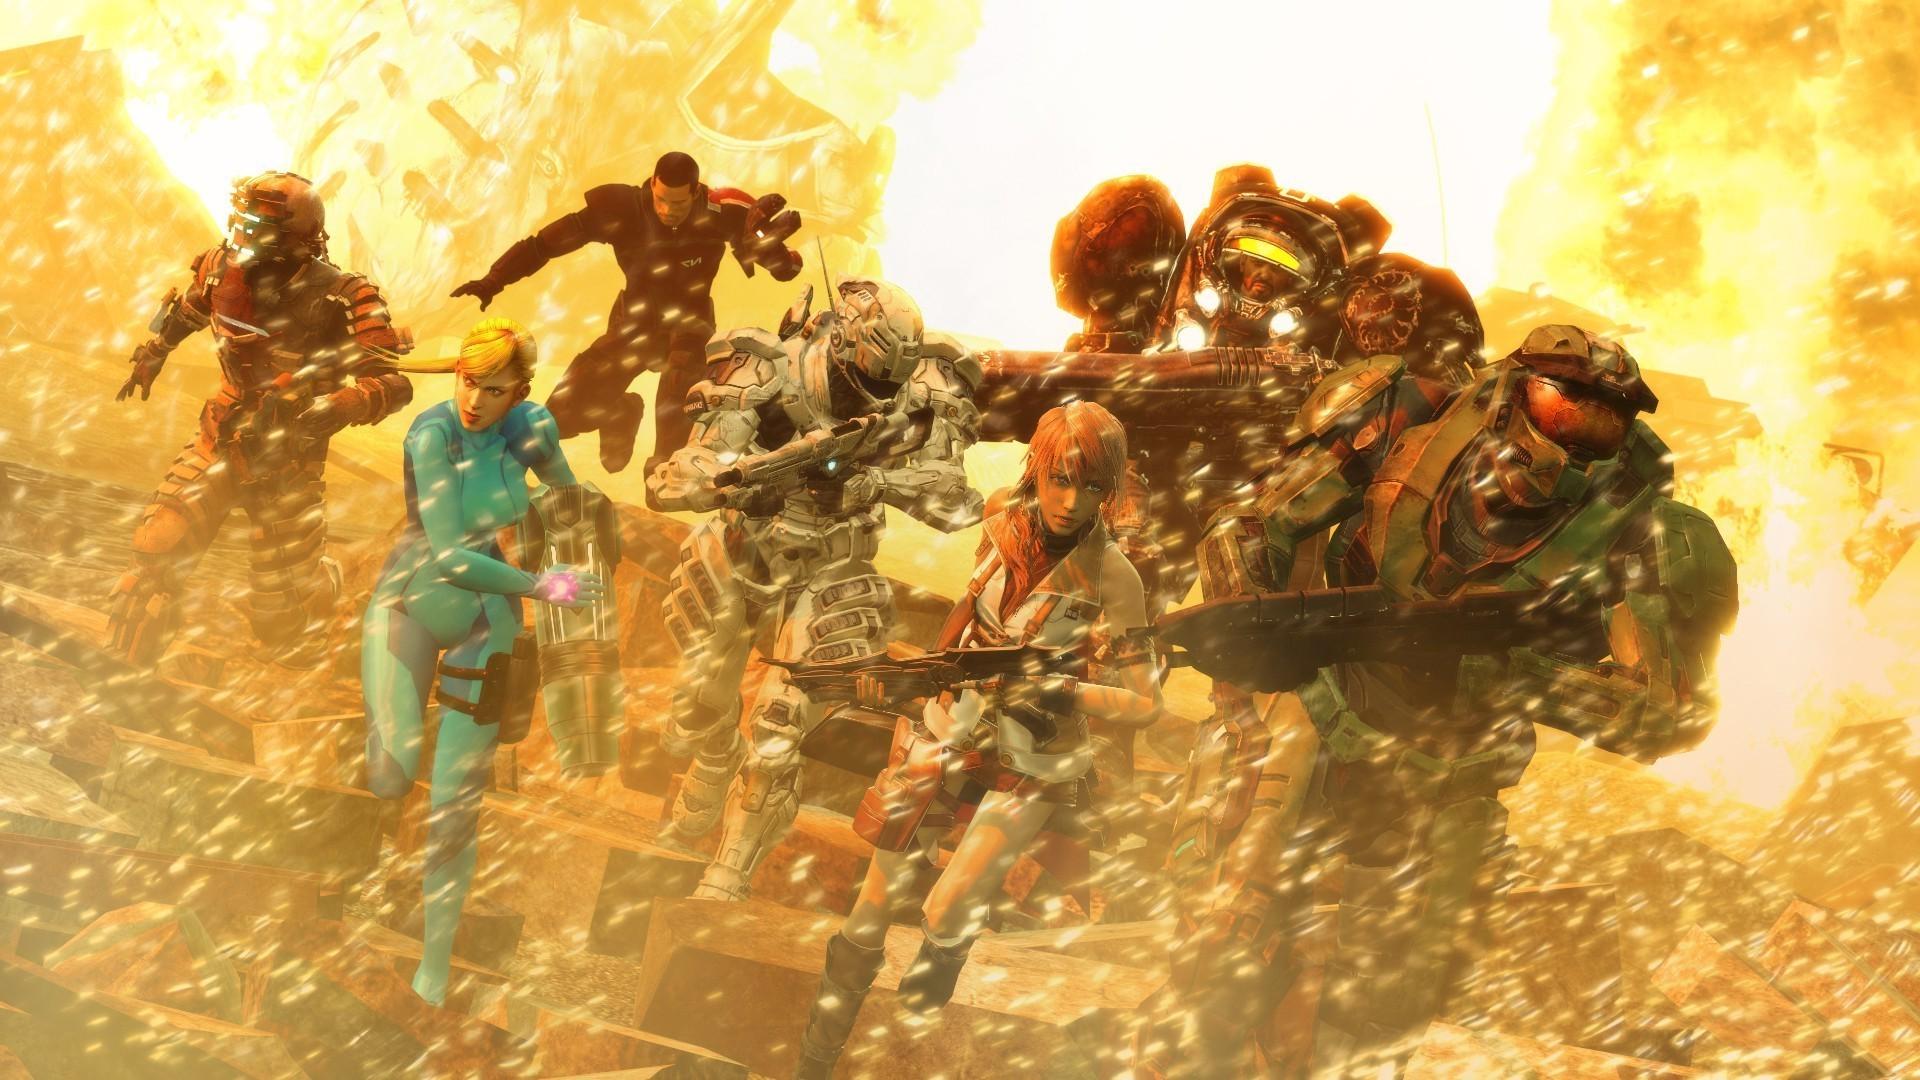 video Games, Master Chief, Commander Shepard, Samus Aran, Zero Suit Samus,  Isaac Clarke, Jim Raynor Wallpapers HD / Desktop and Mobile Backgrounds